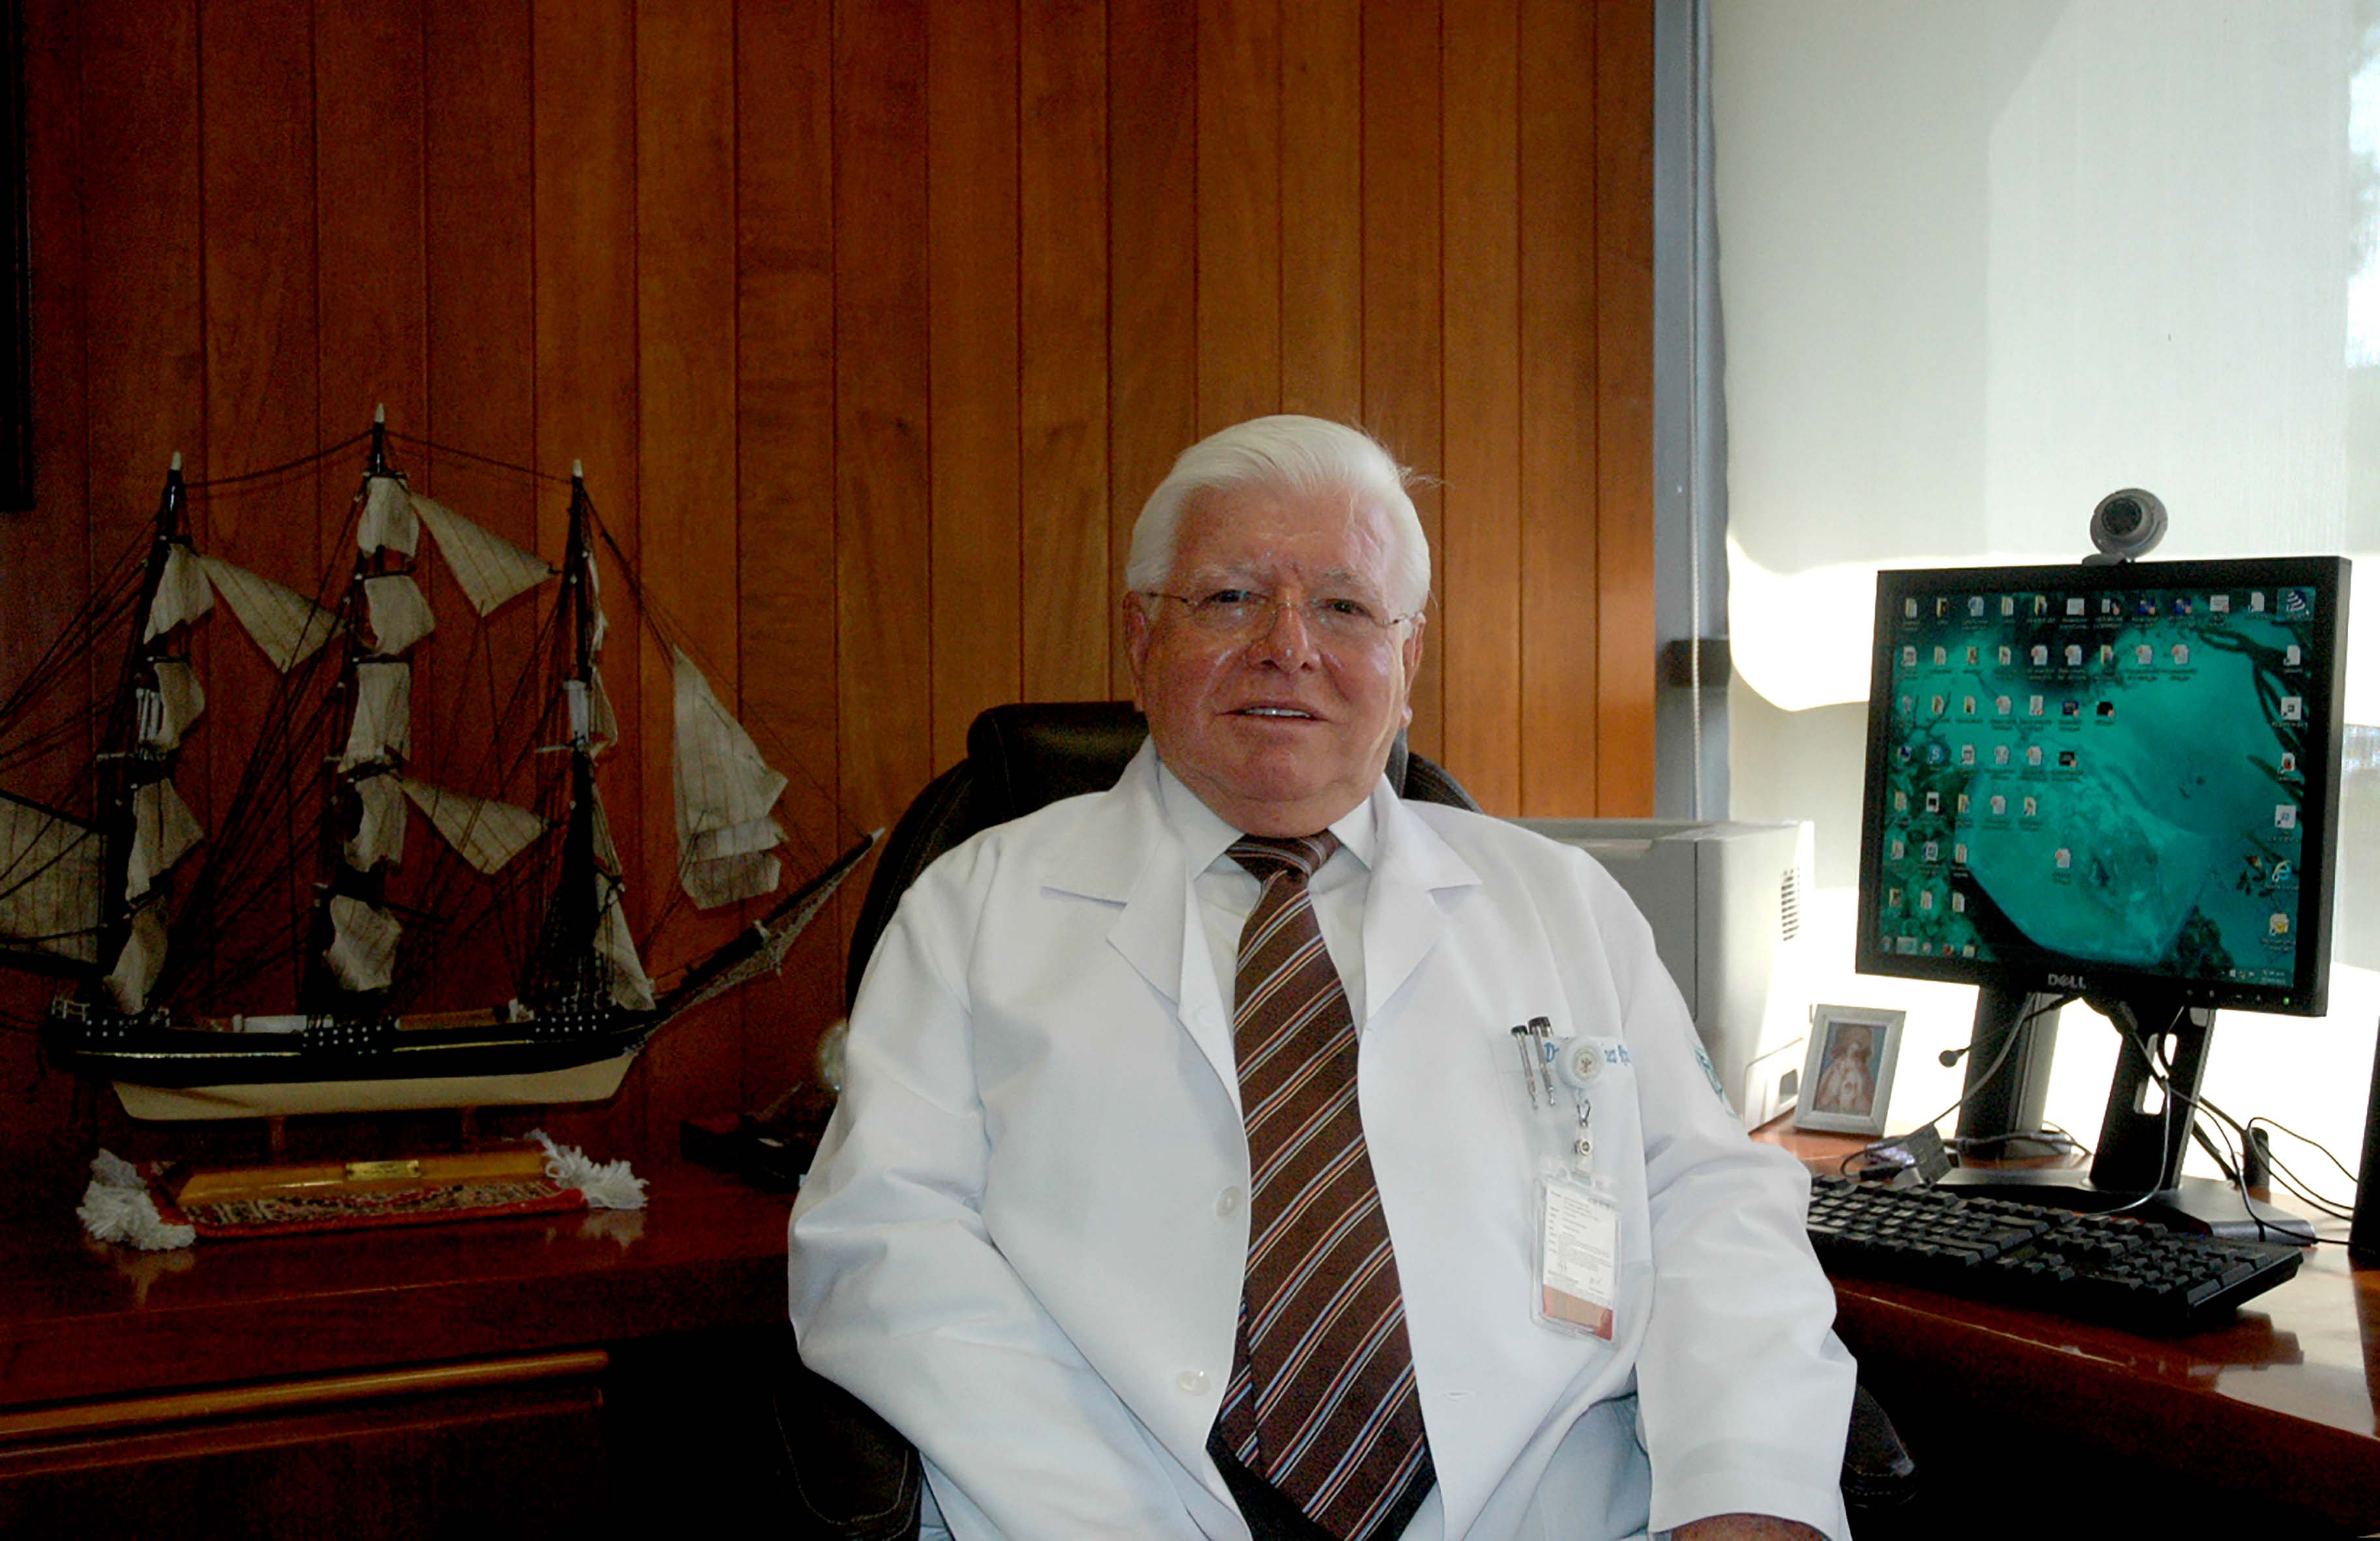 070715 Dr. Marco Antonio Mart nez R os Dir. Gral. 02.jpg